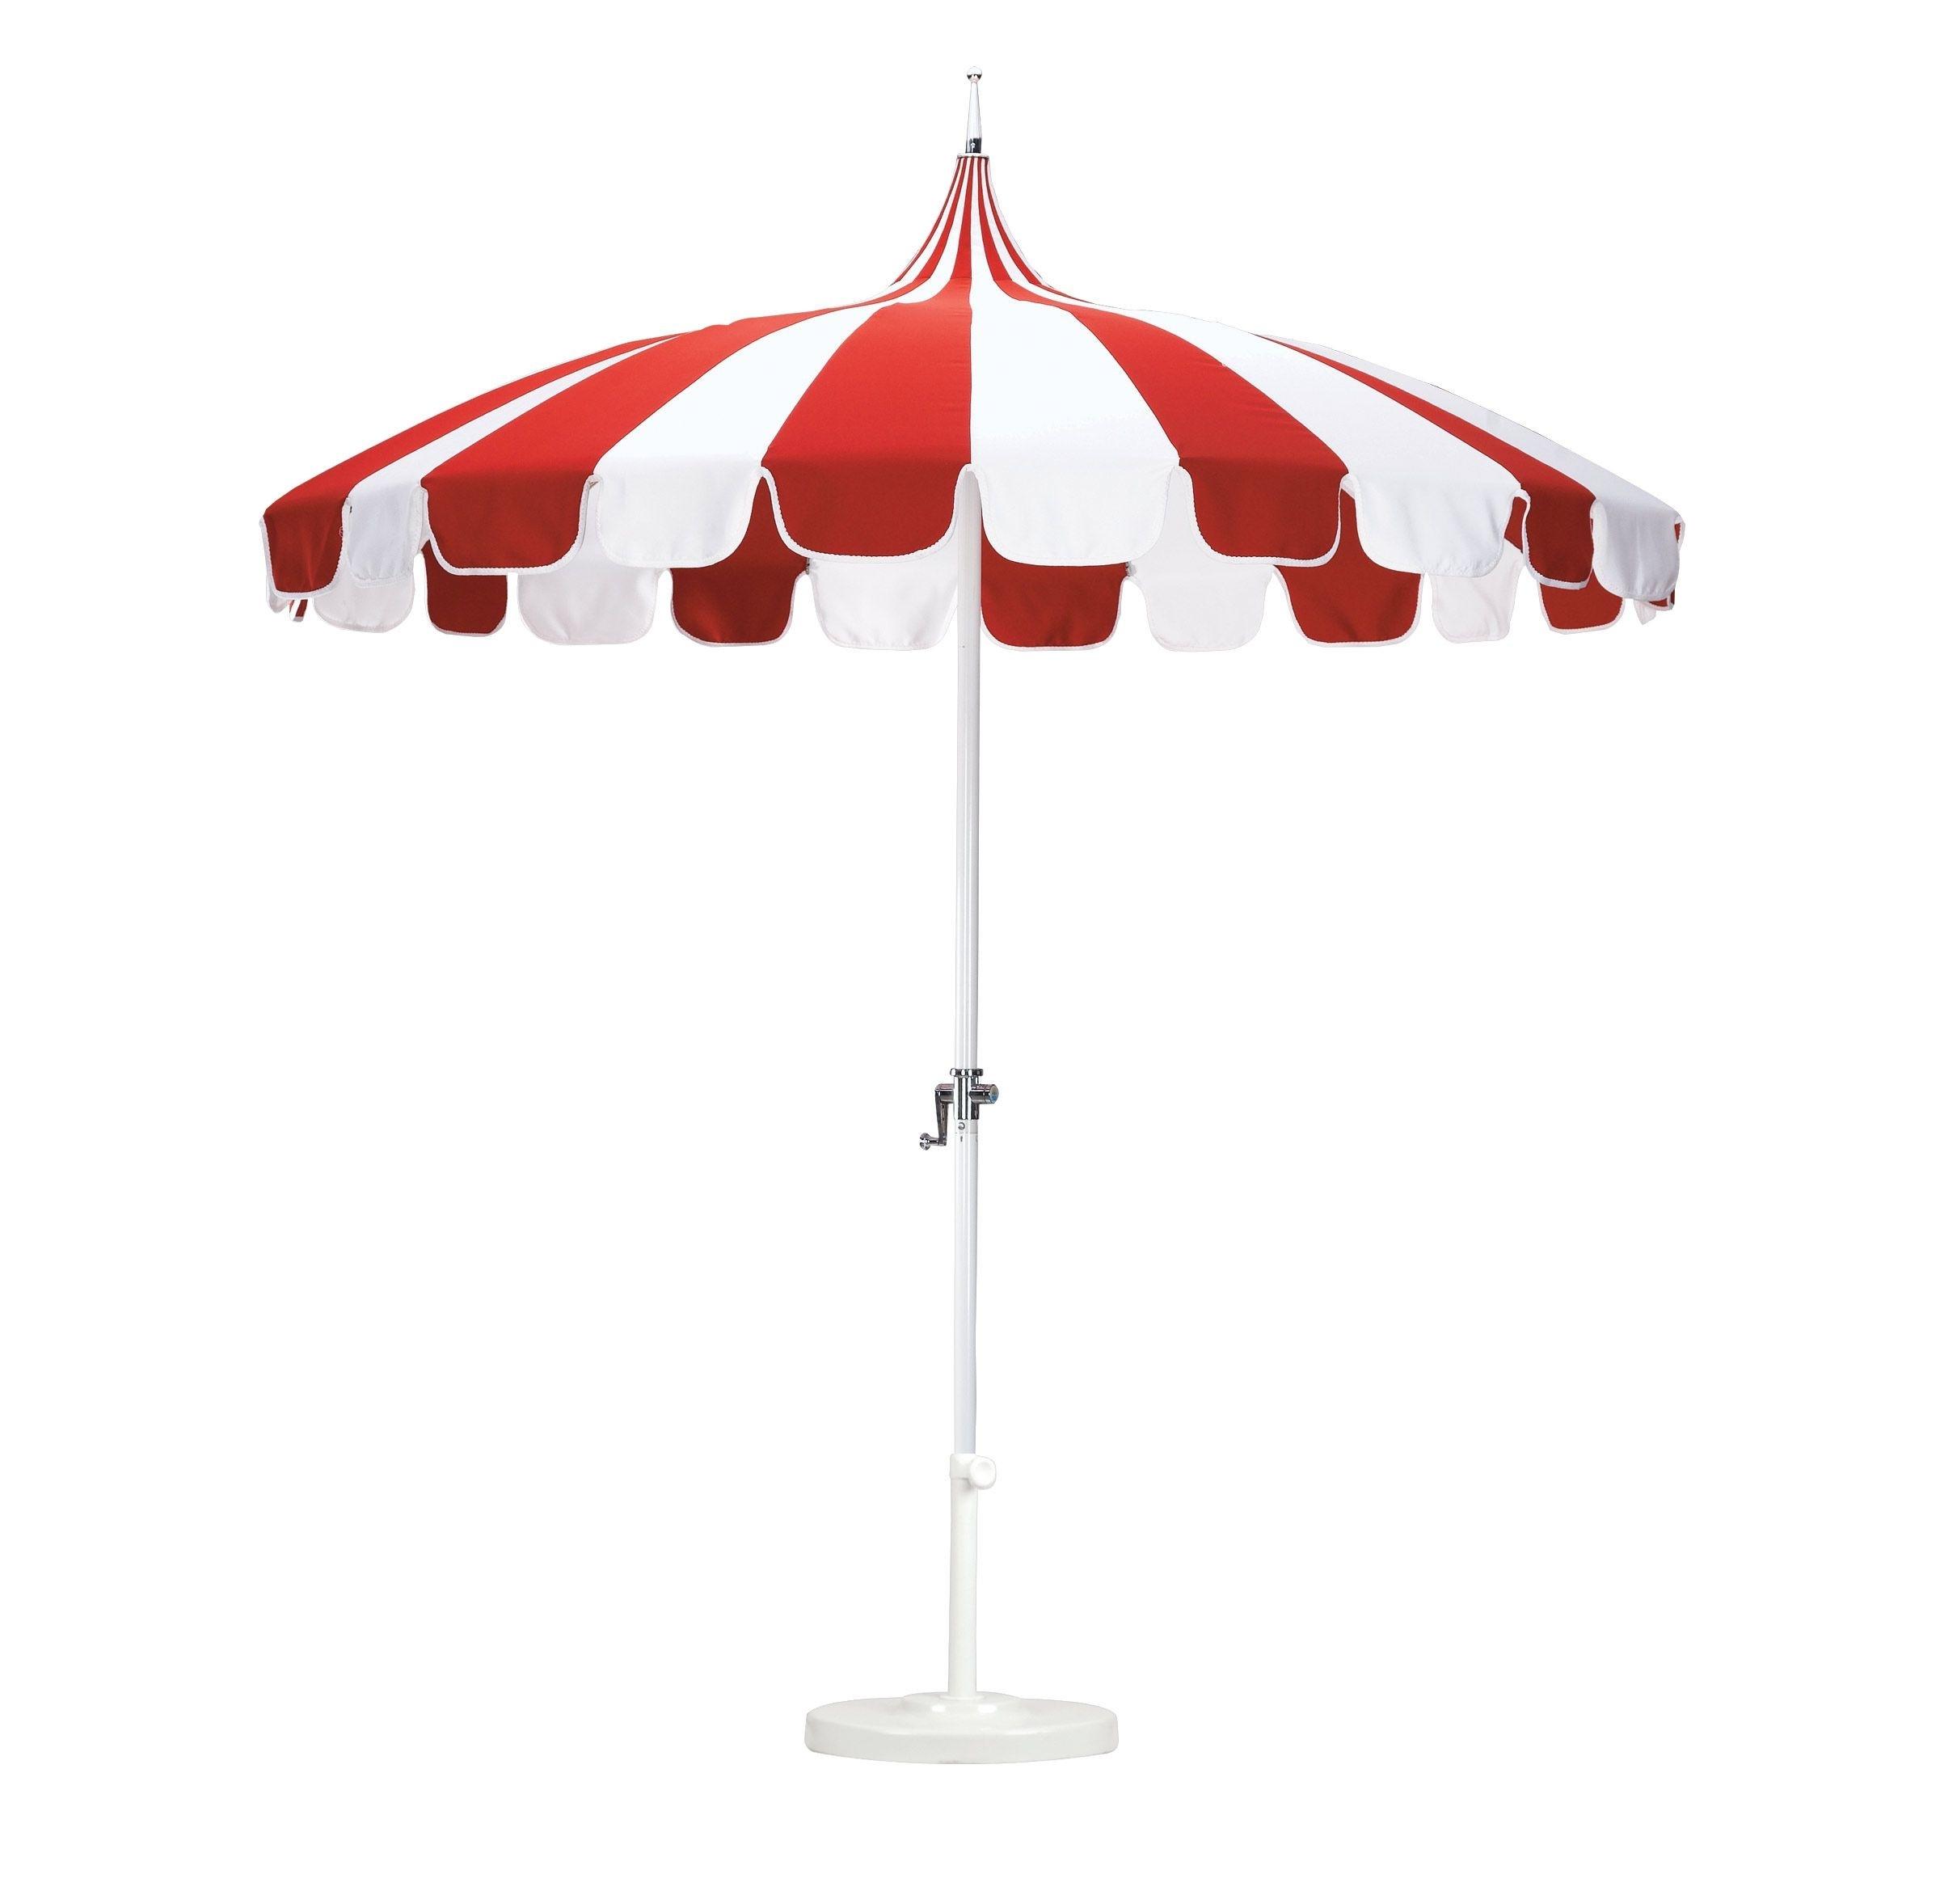 Recent Outdoor Umbrella Weights Lovely Sunbrella Patio Umbrella Look More With Red Sunbrella Patio Umbrellas (View 10 of 20)